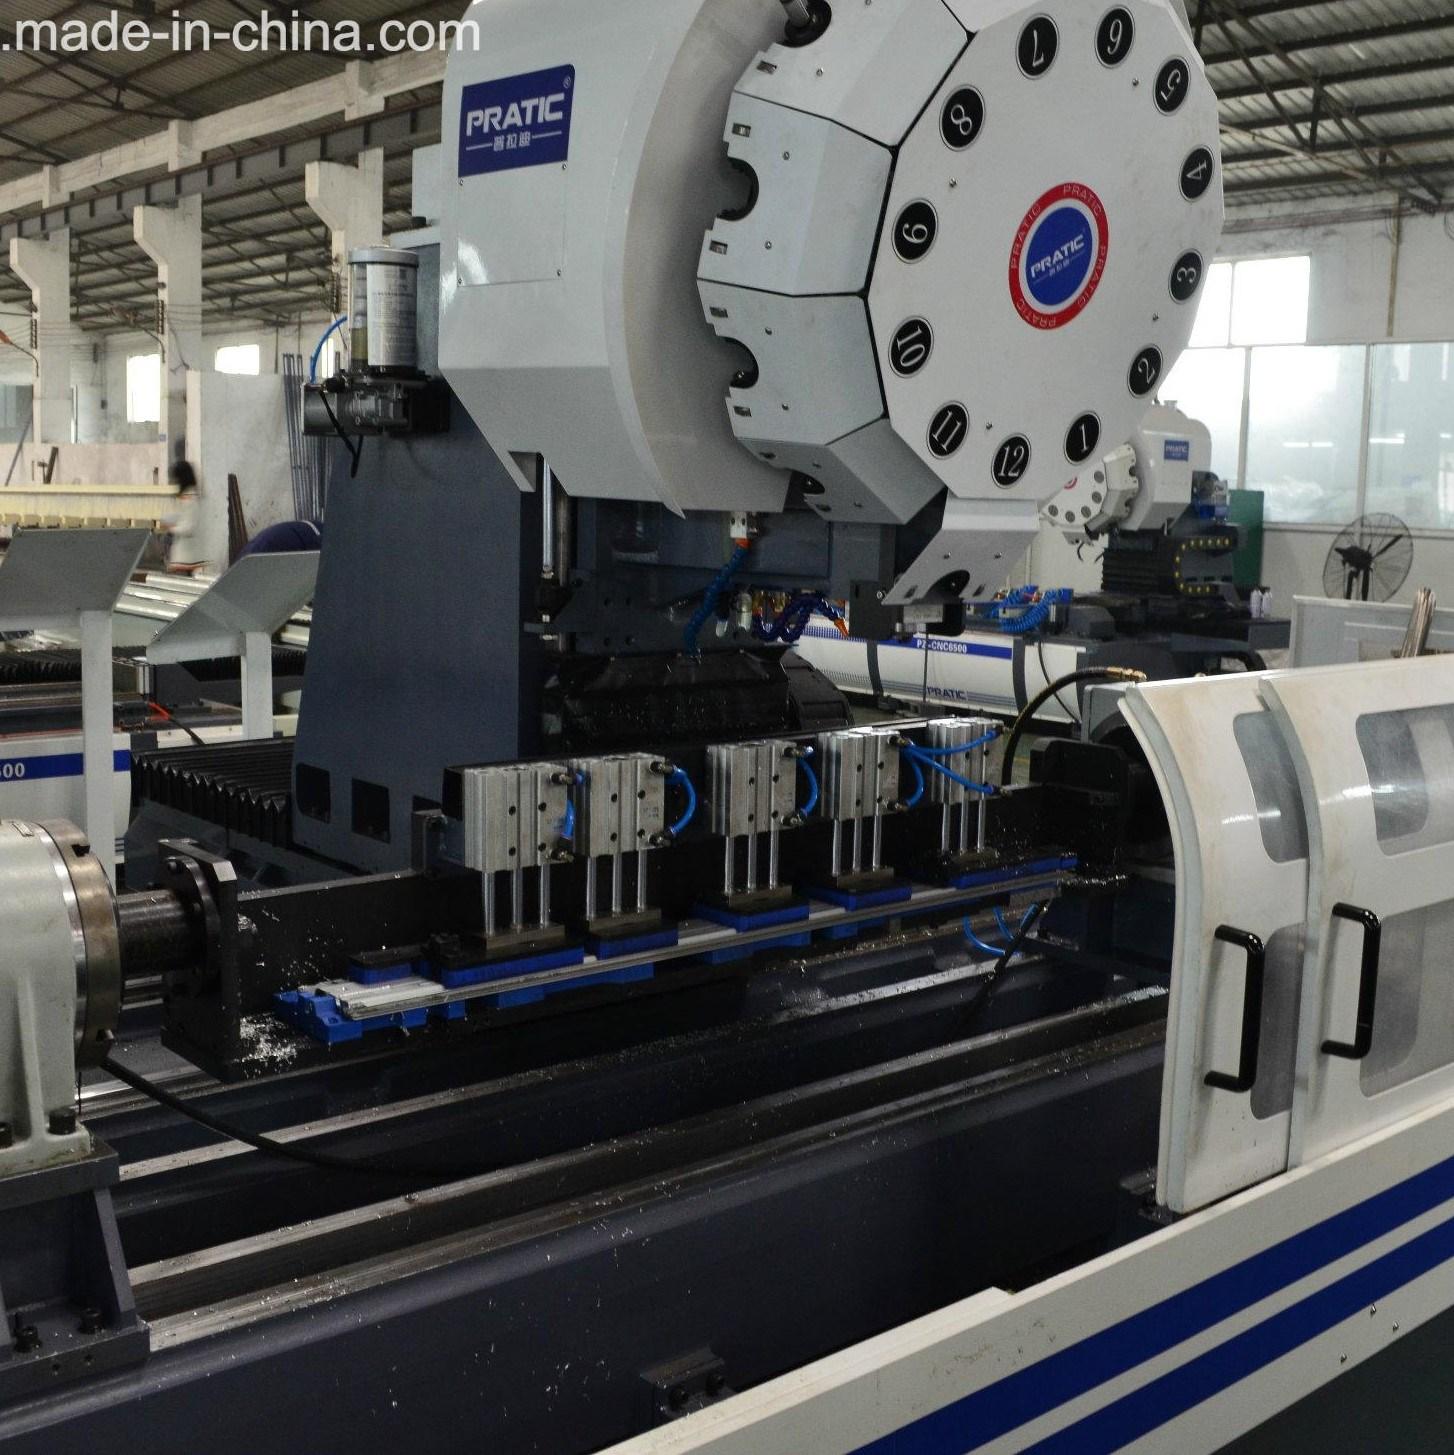 CNC Alunimum Profile Milling Machine with High Quality-Pratic Pya